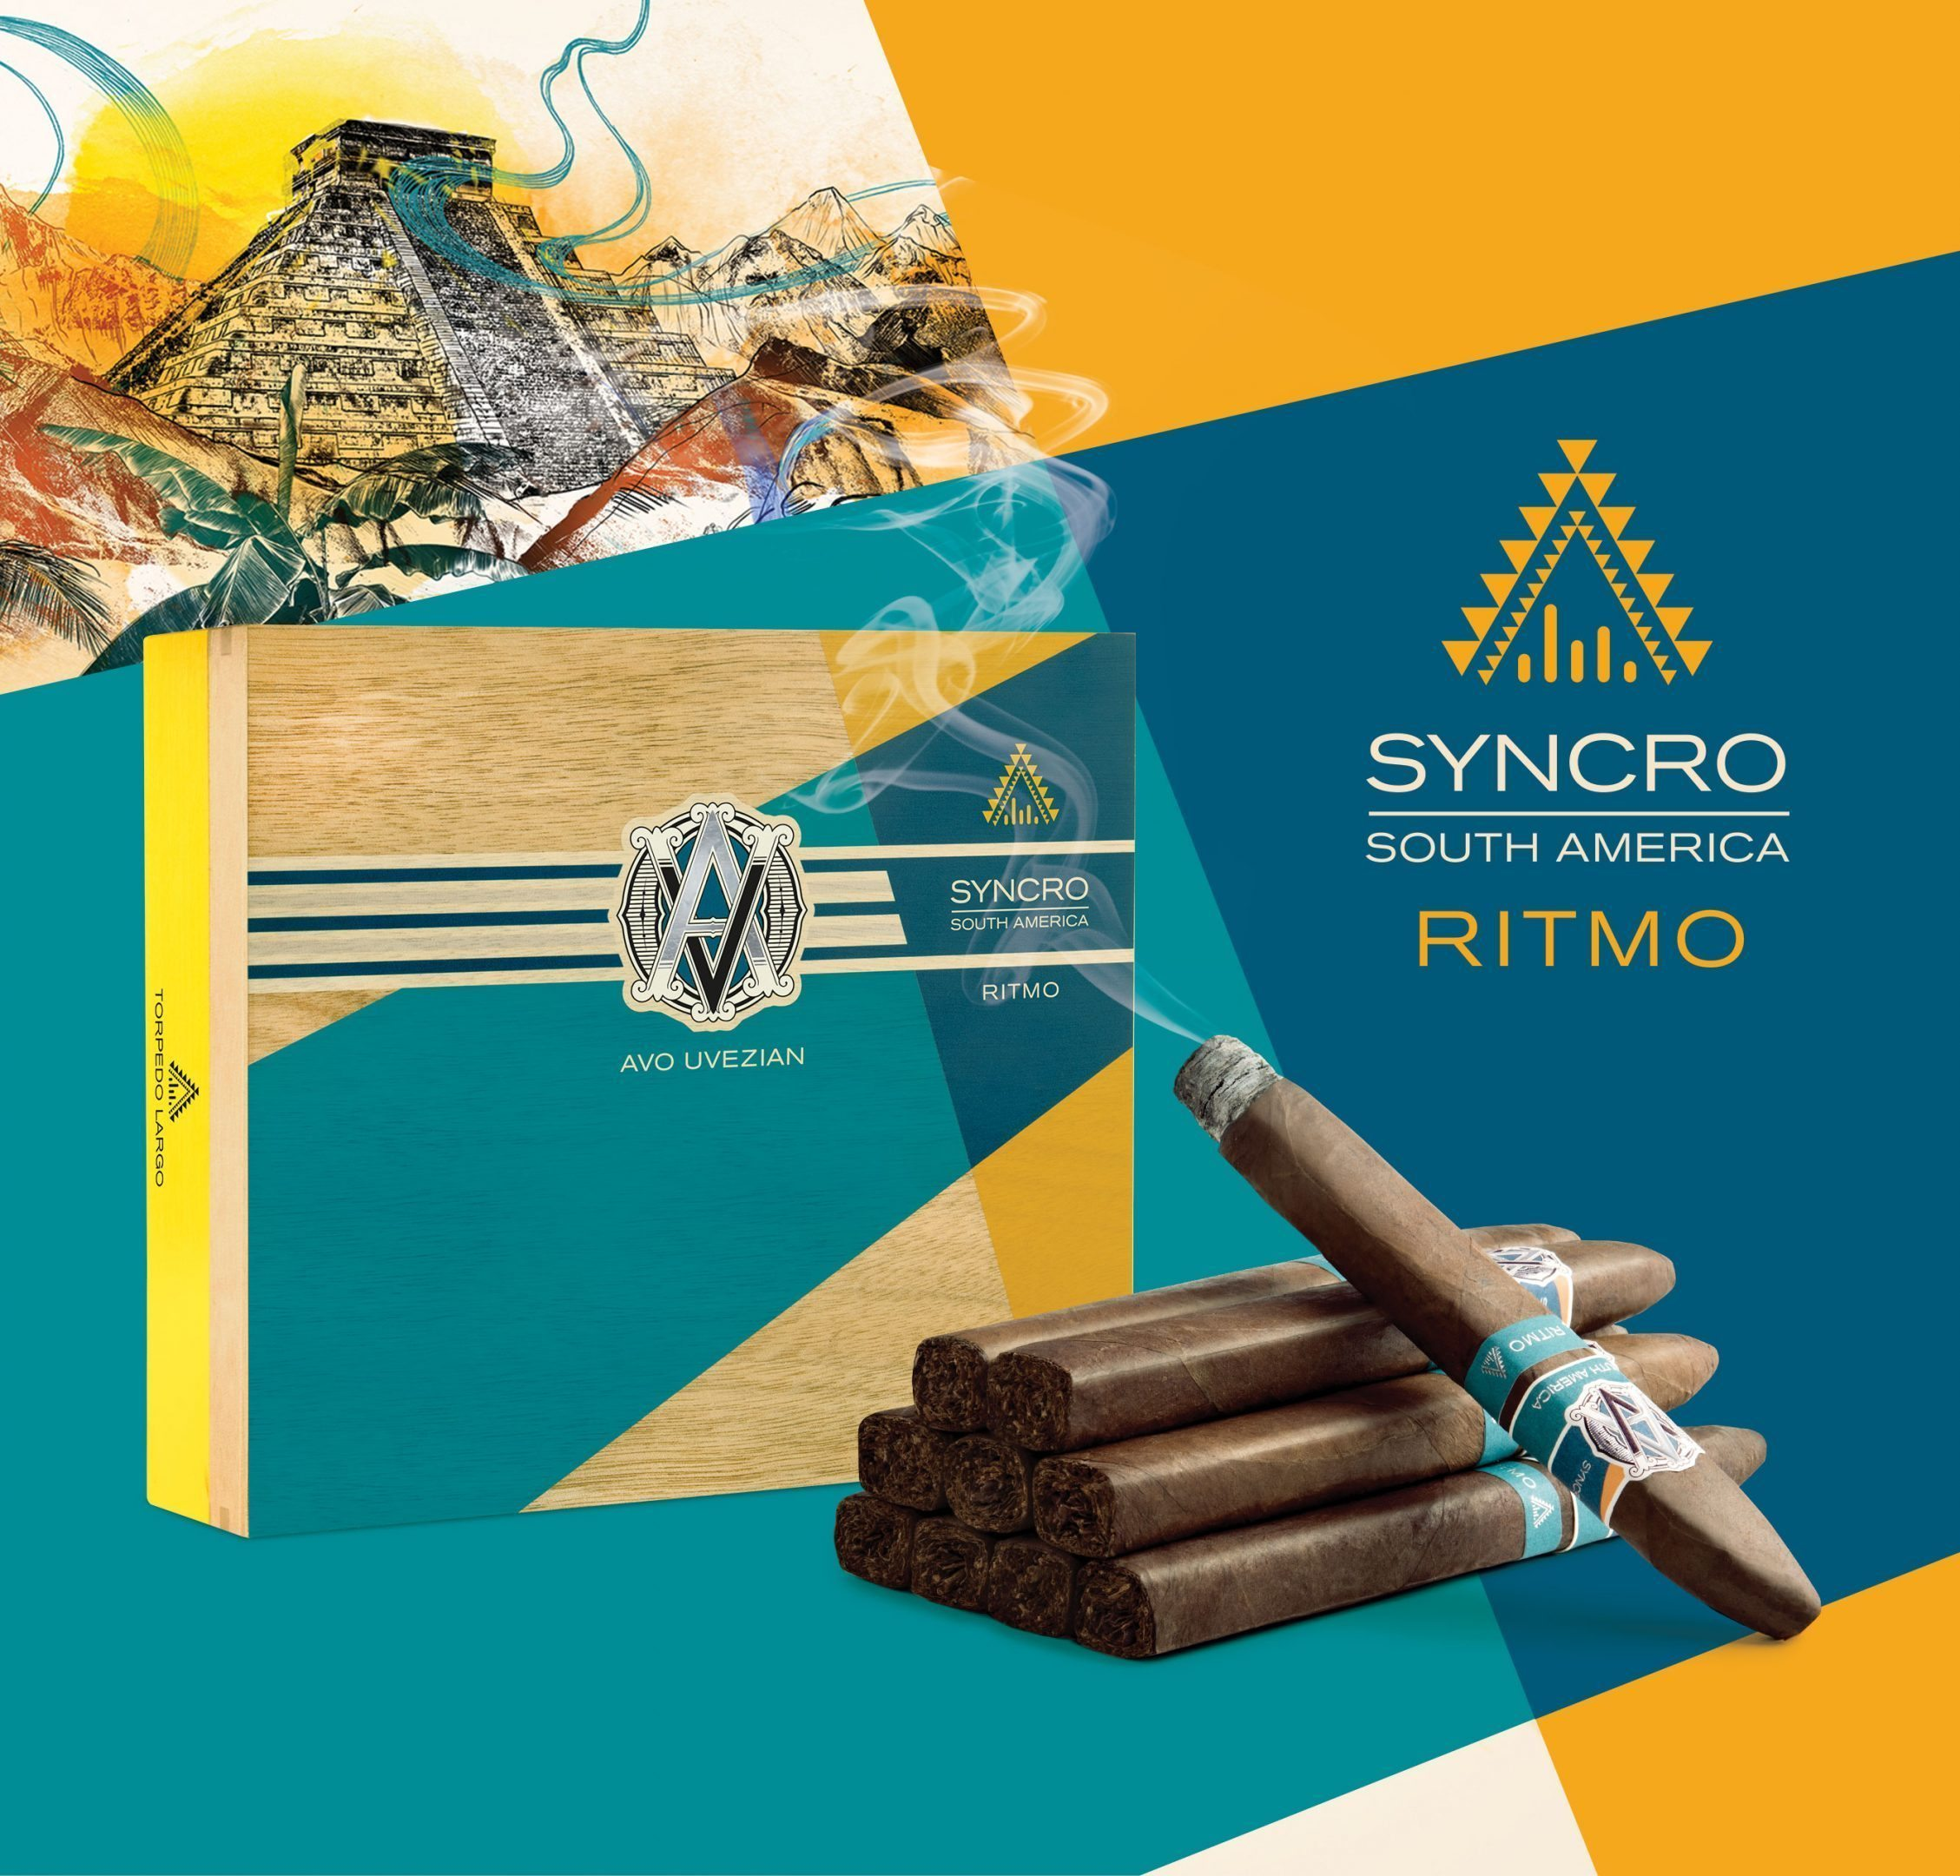 Cigar News: Davidoff Announces AVO Syncro South America Ritmo